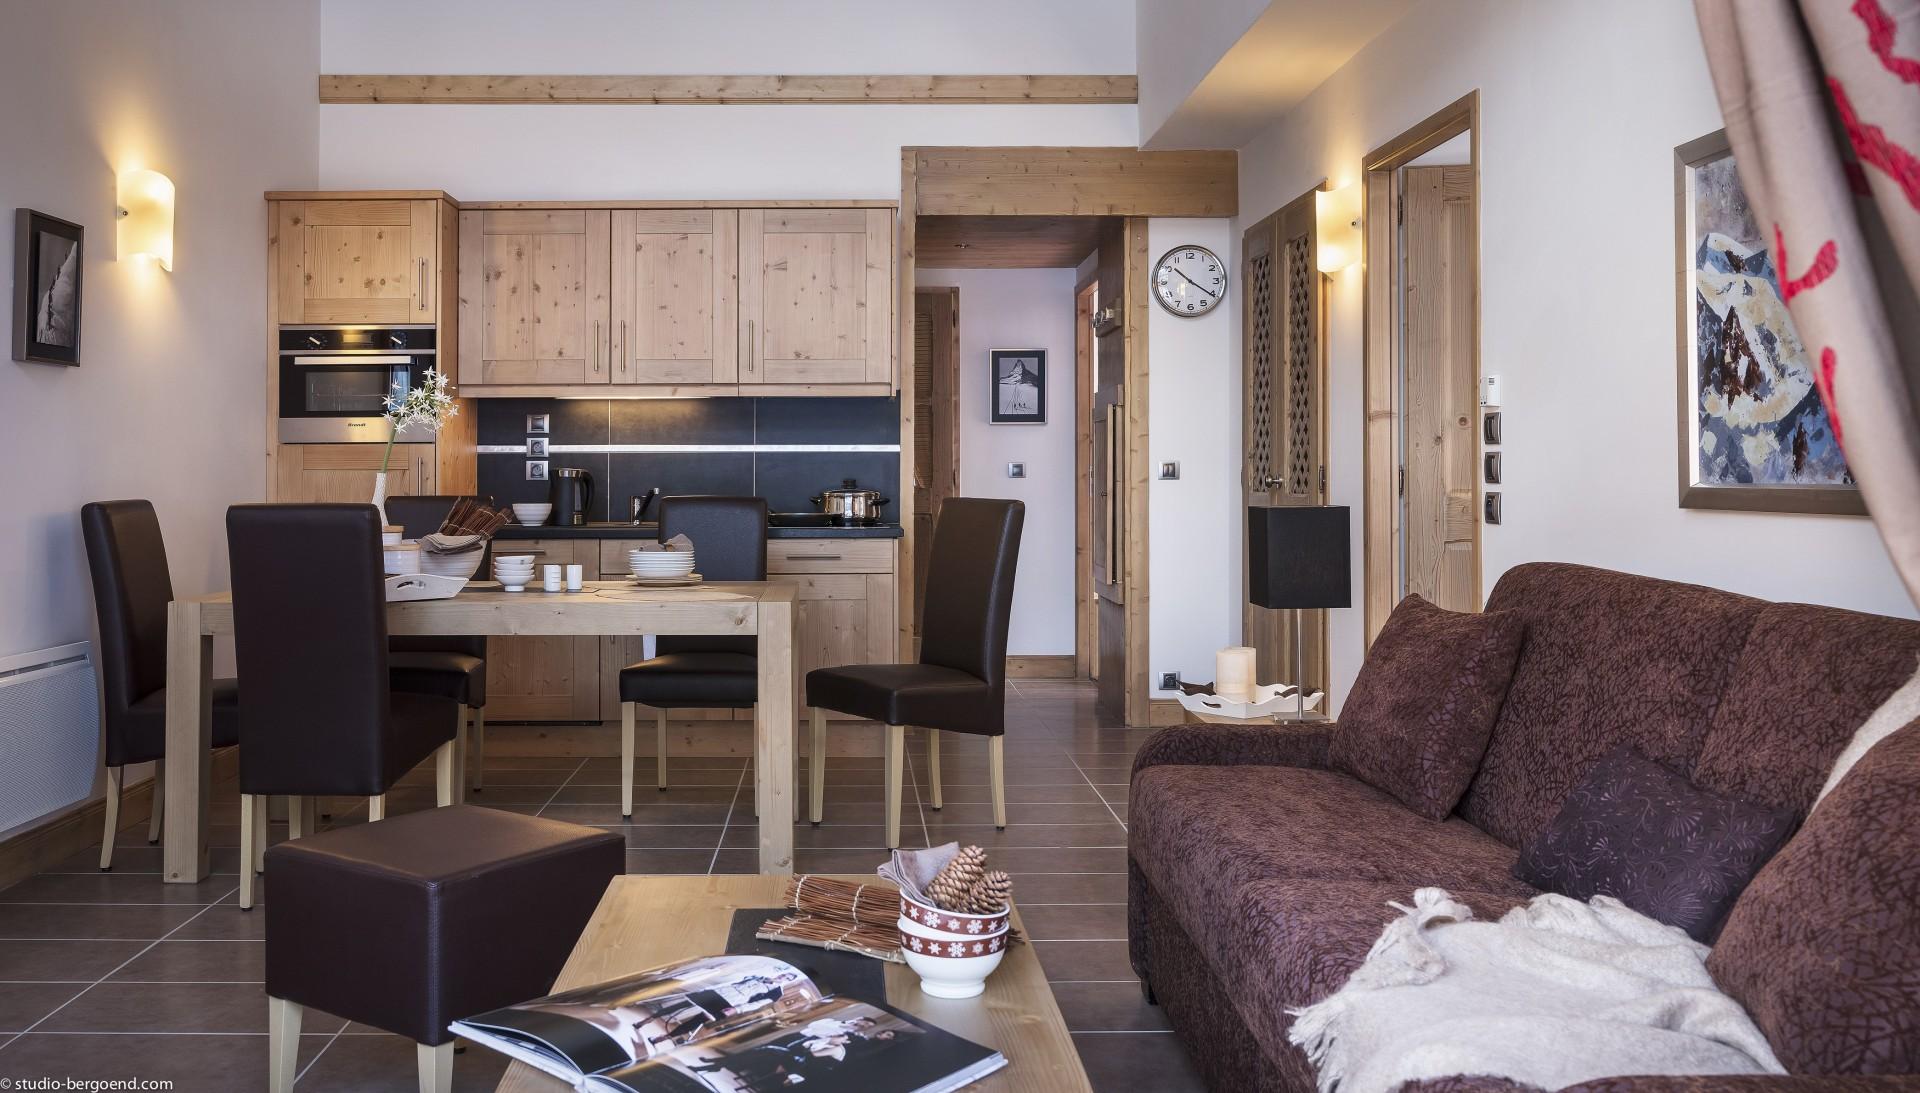 les-carroz-d-araches-location-appartement-luxe-limo